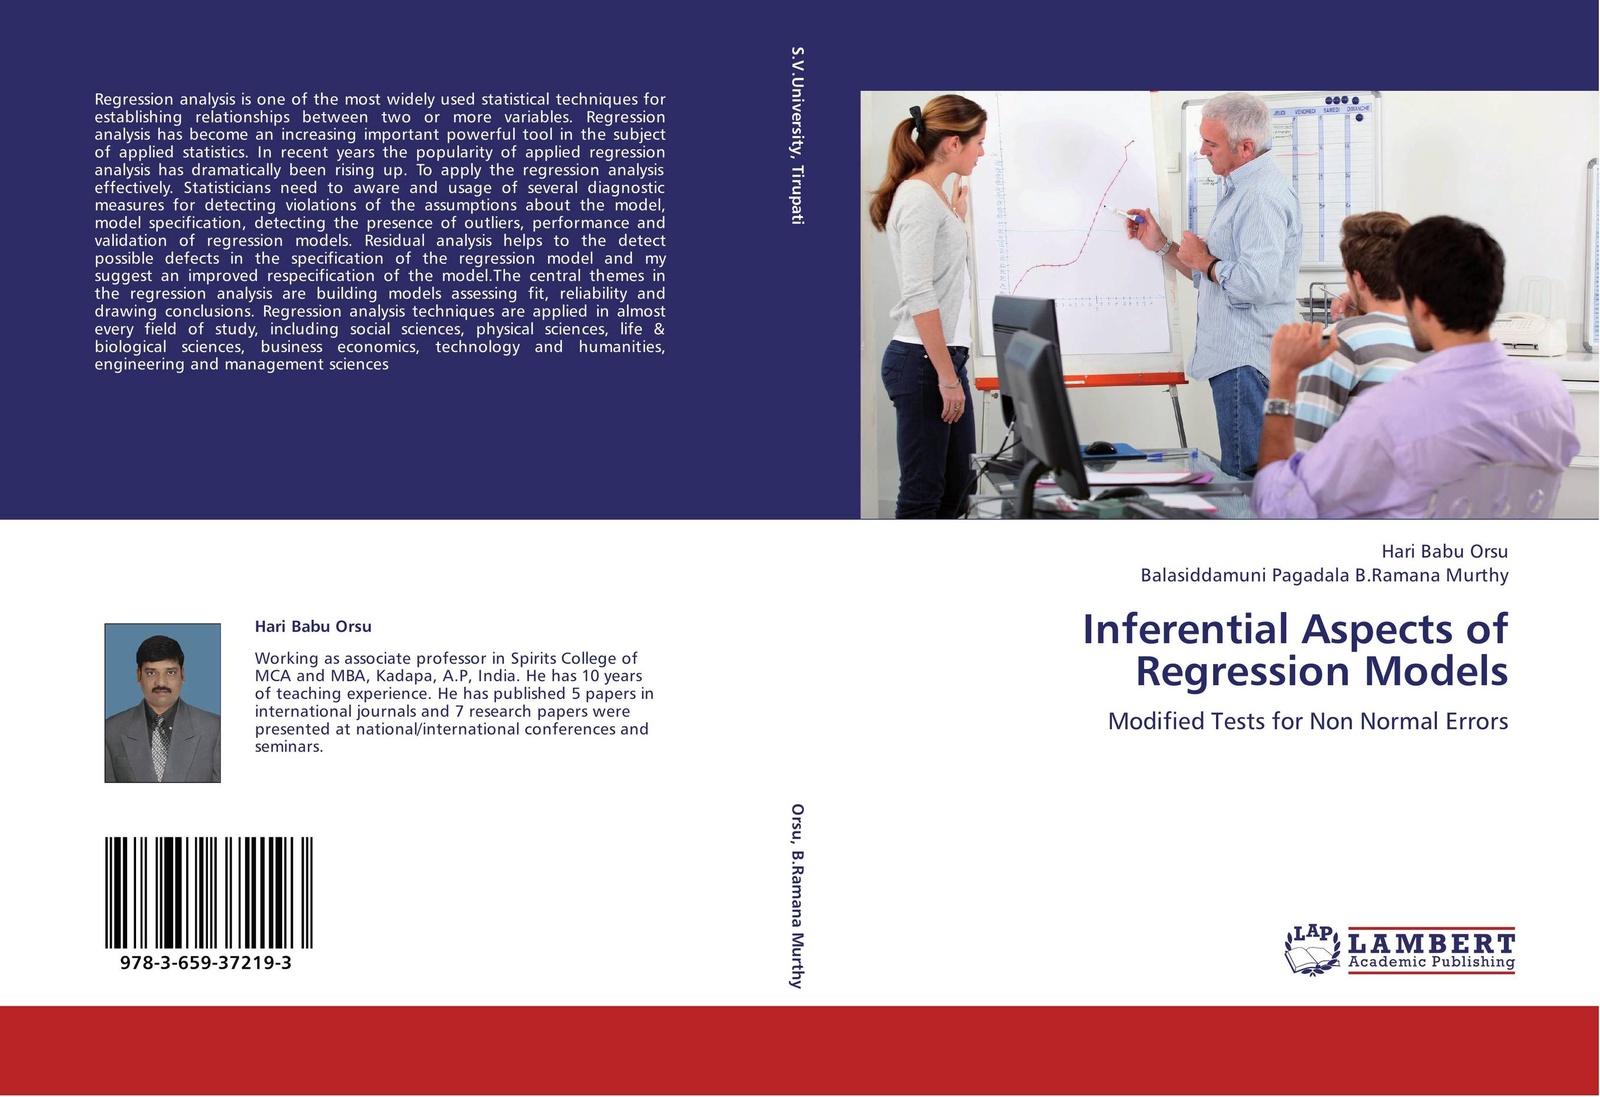 Hari Babu Orsu and Balasiddamuni Pagadala B.Ramana Murthy Inferential Aspects of Regression Models недорго, оригинальная цена